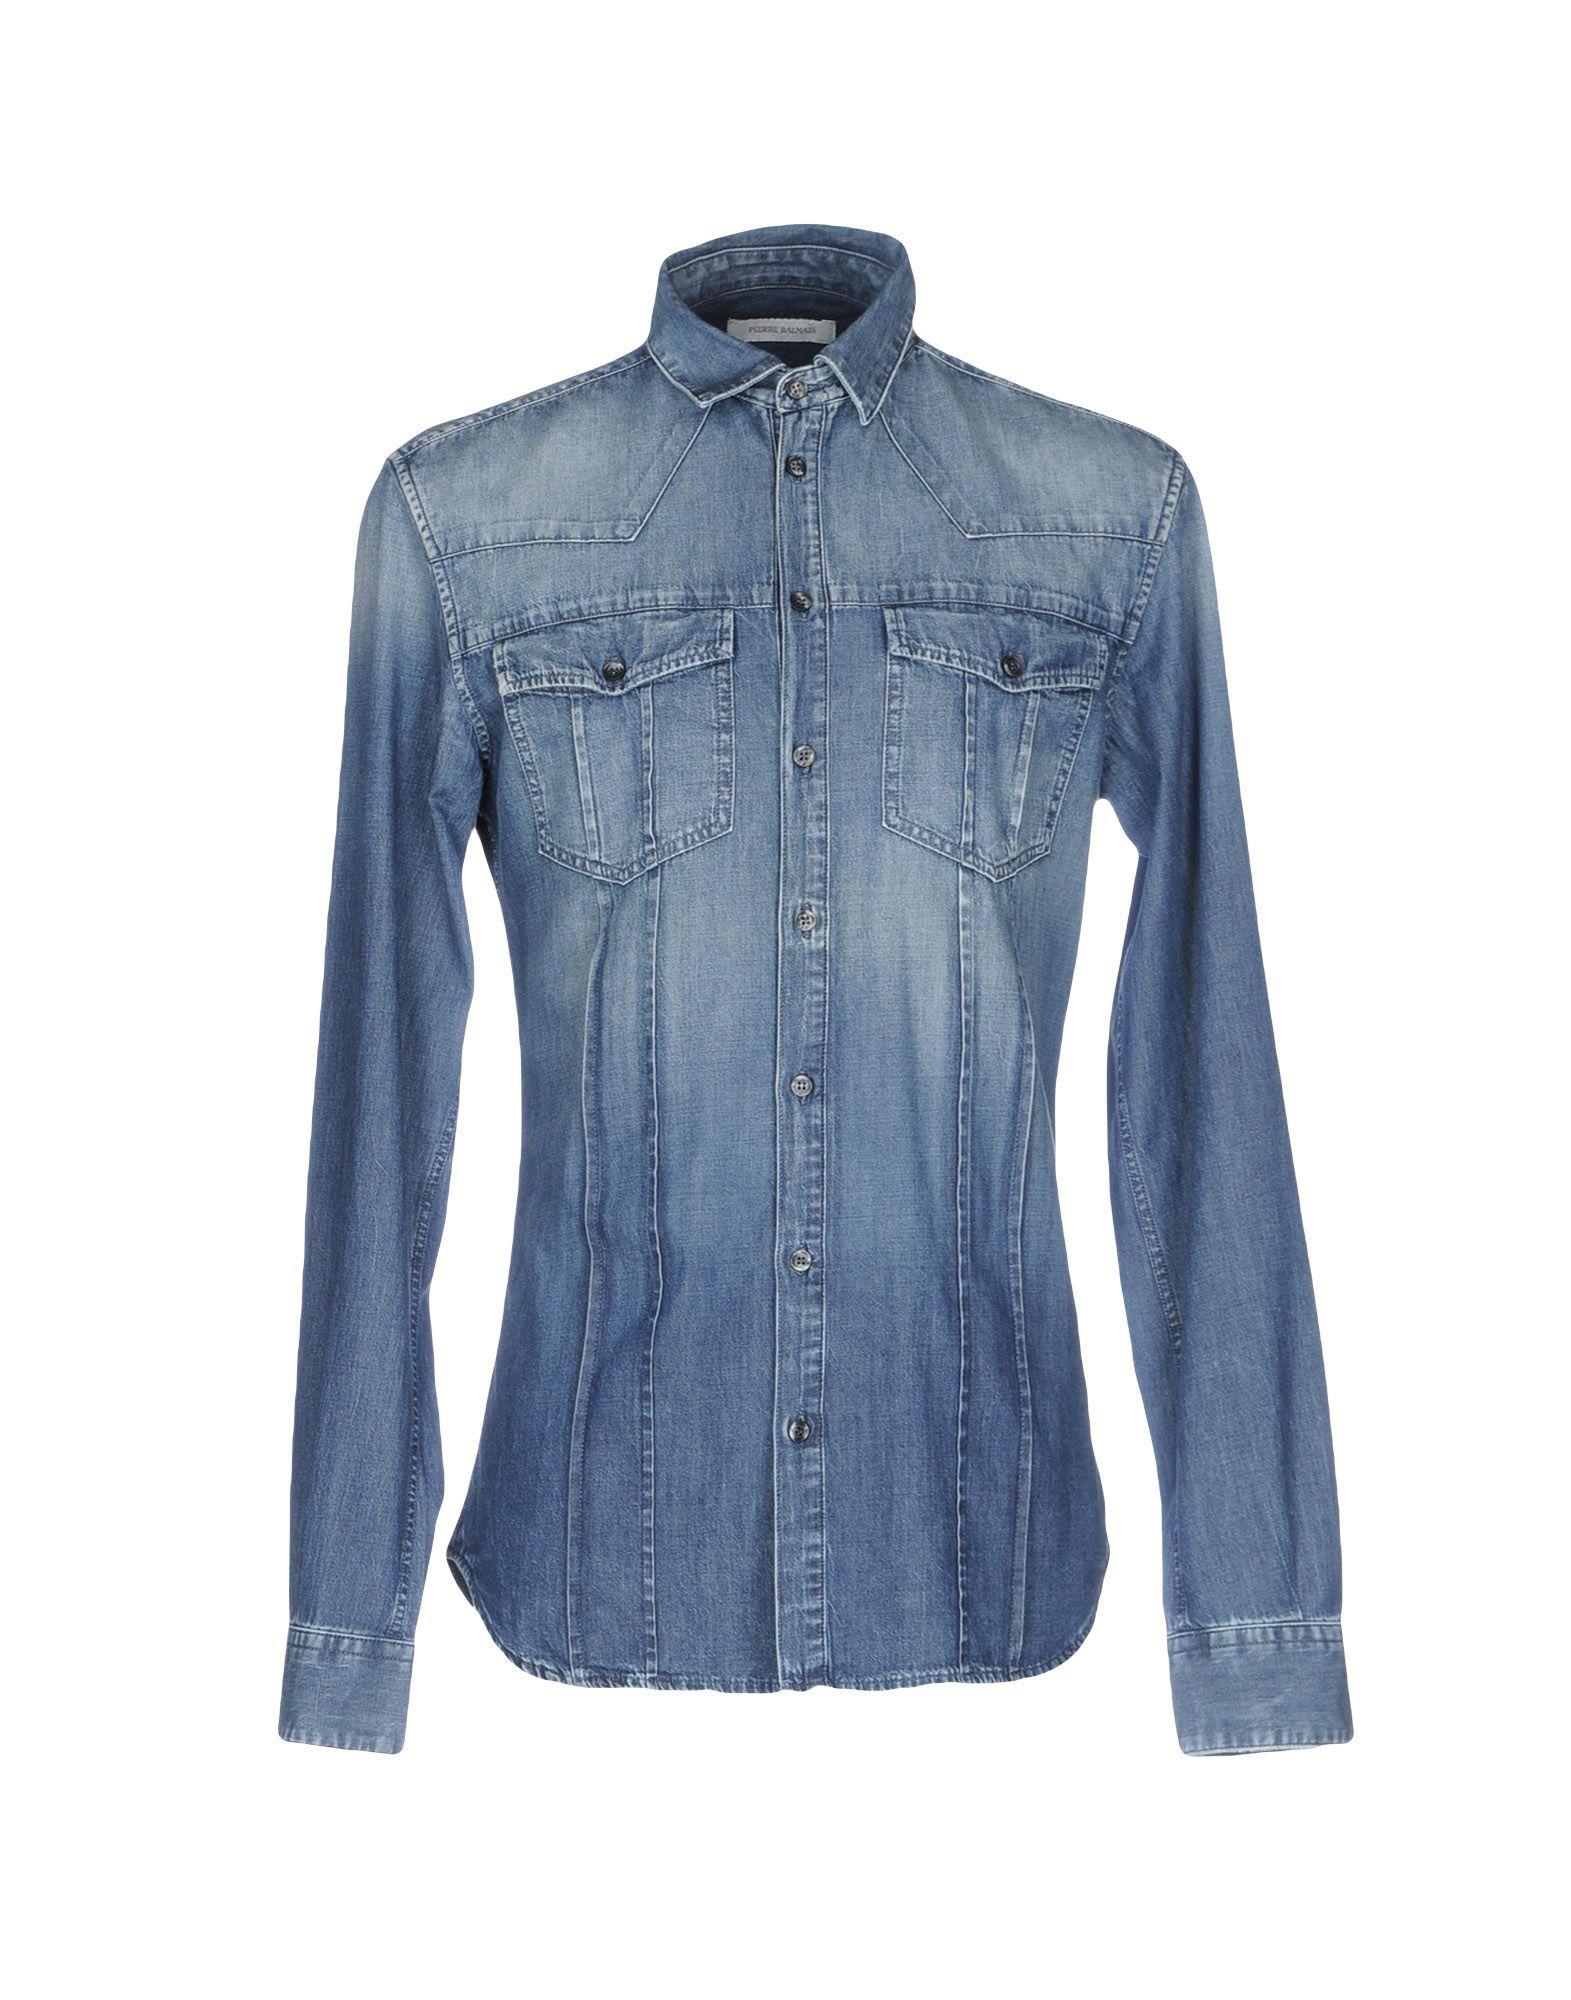 594db1ecbf Pierre Balmain Denim Shirt - Men Pierre Balmain Denim Shirts online ...